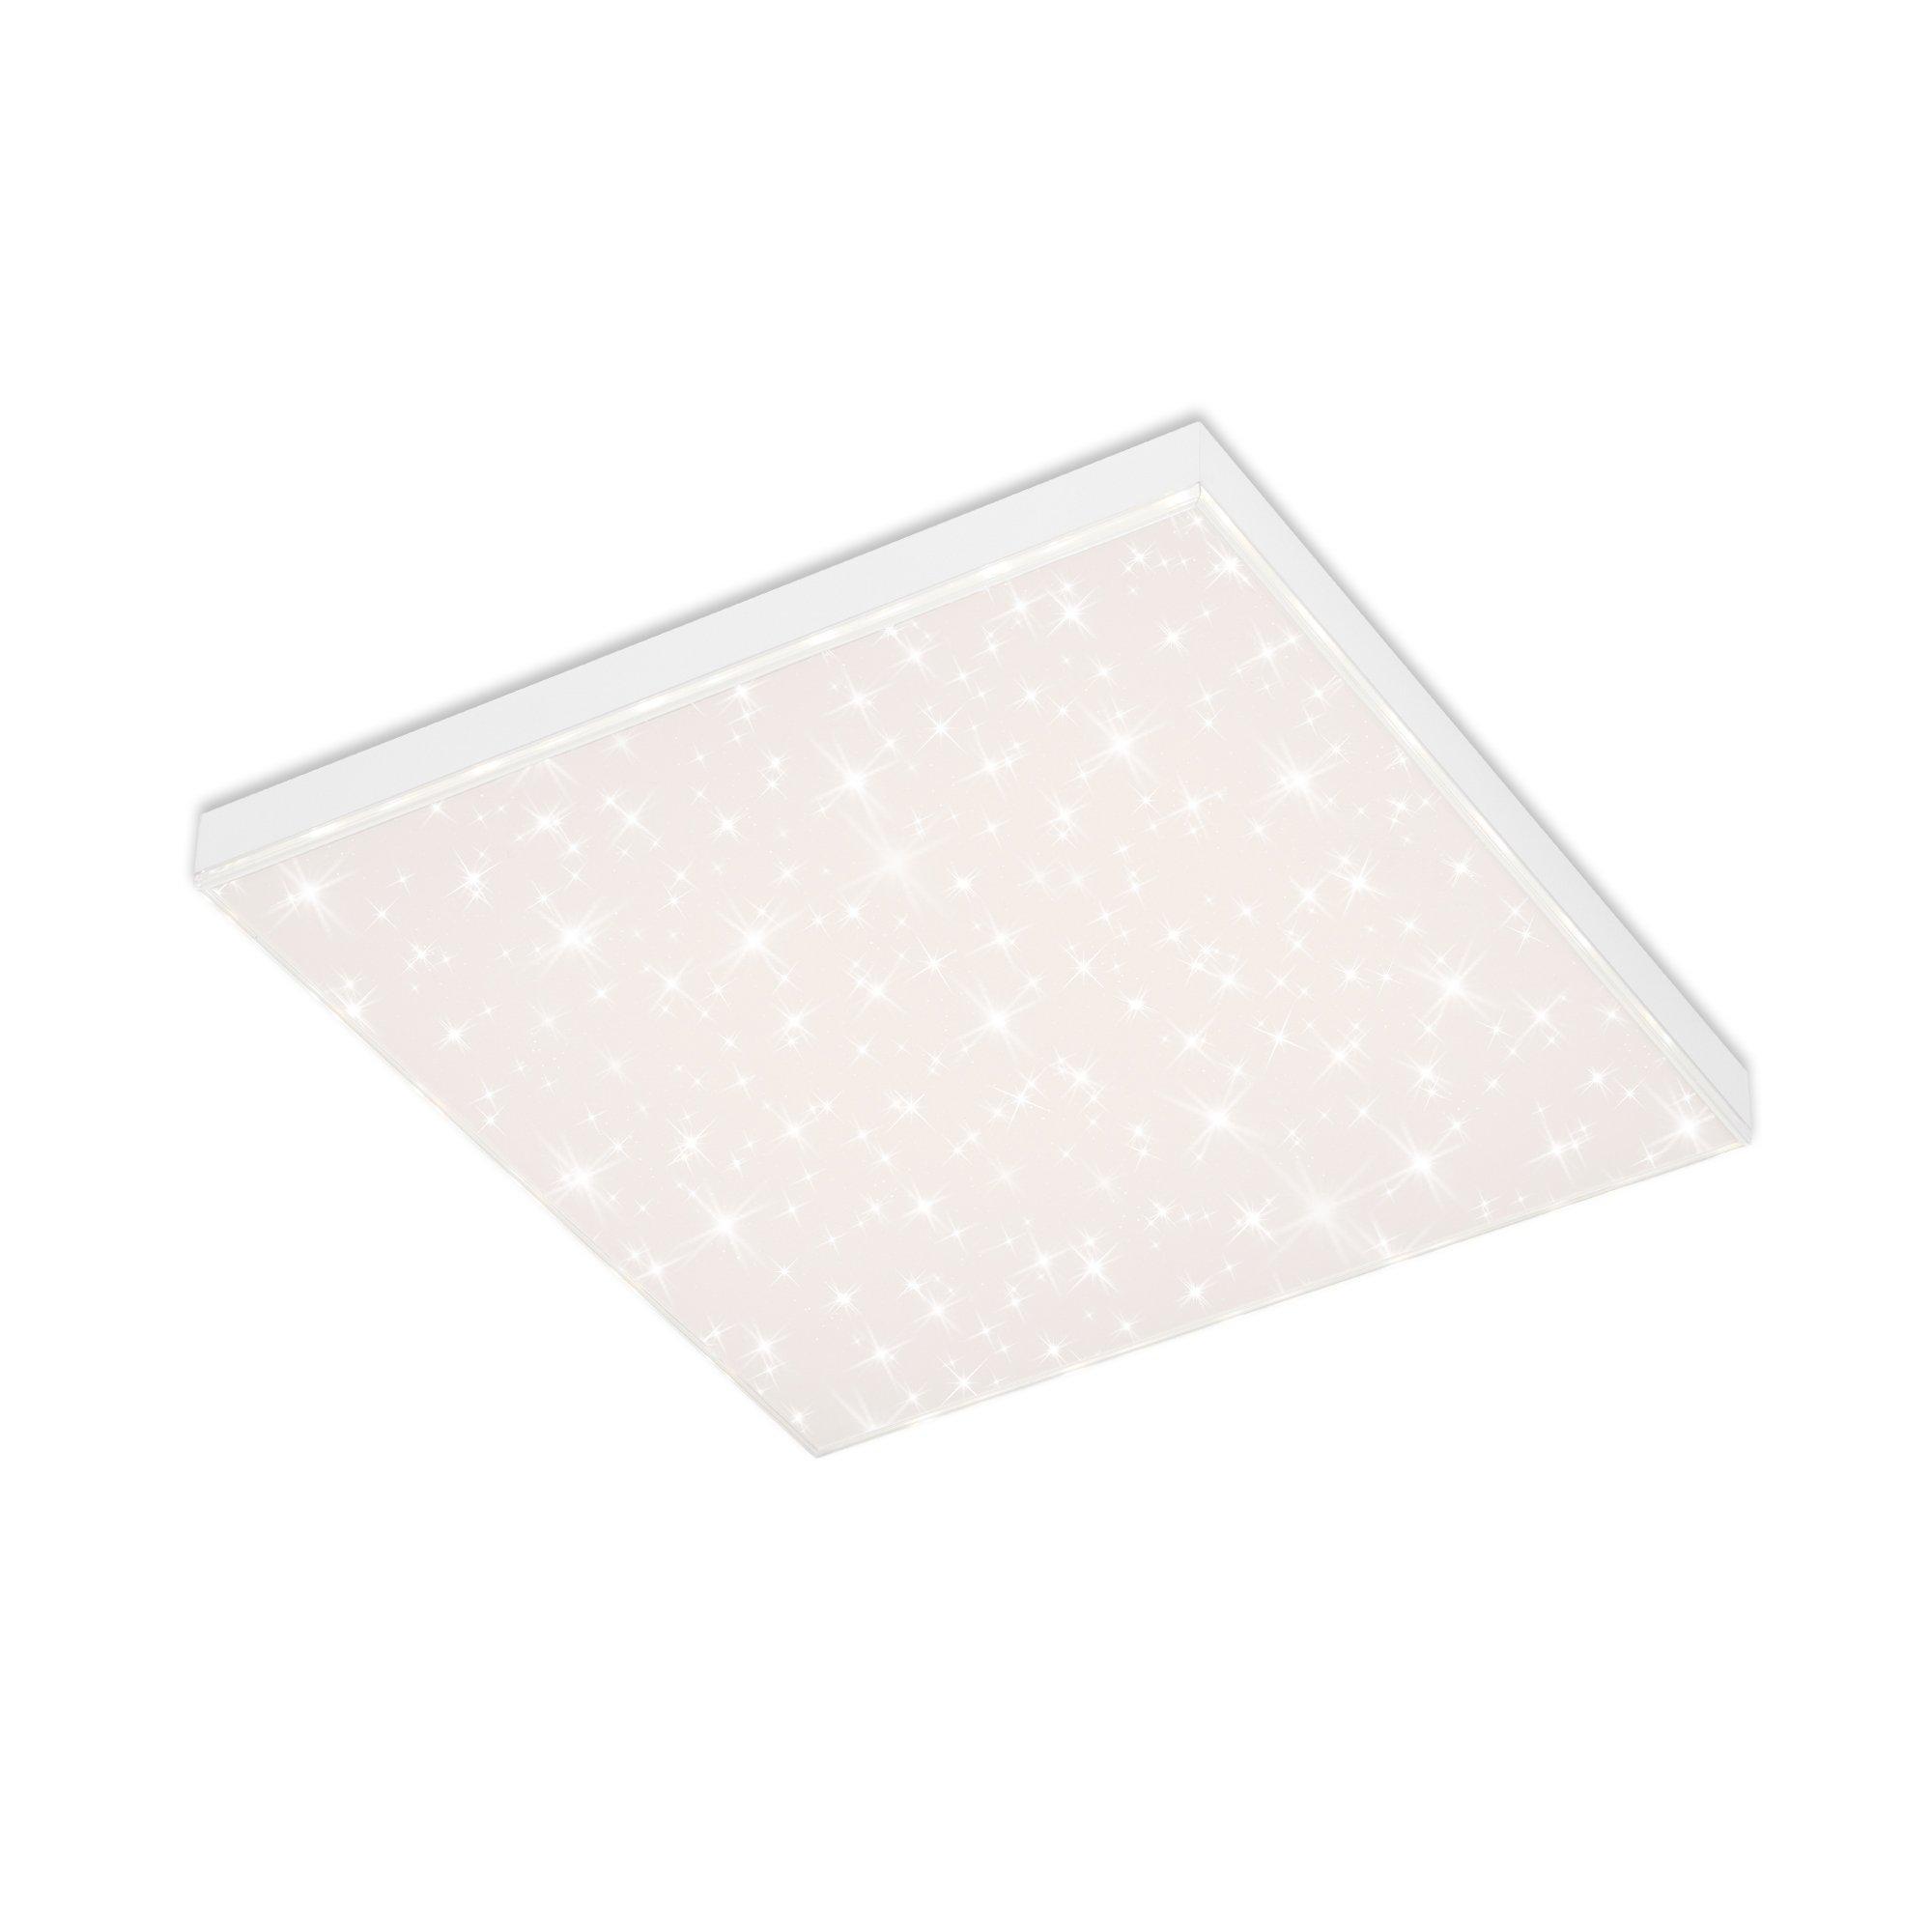 CCT LED Panel, 45 cm, 15 W, Weiss